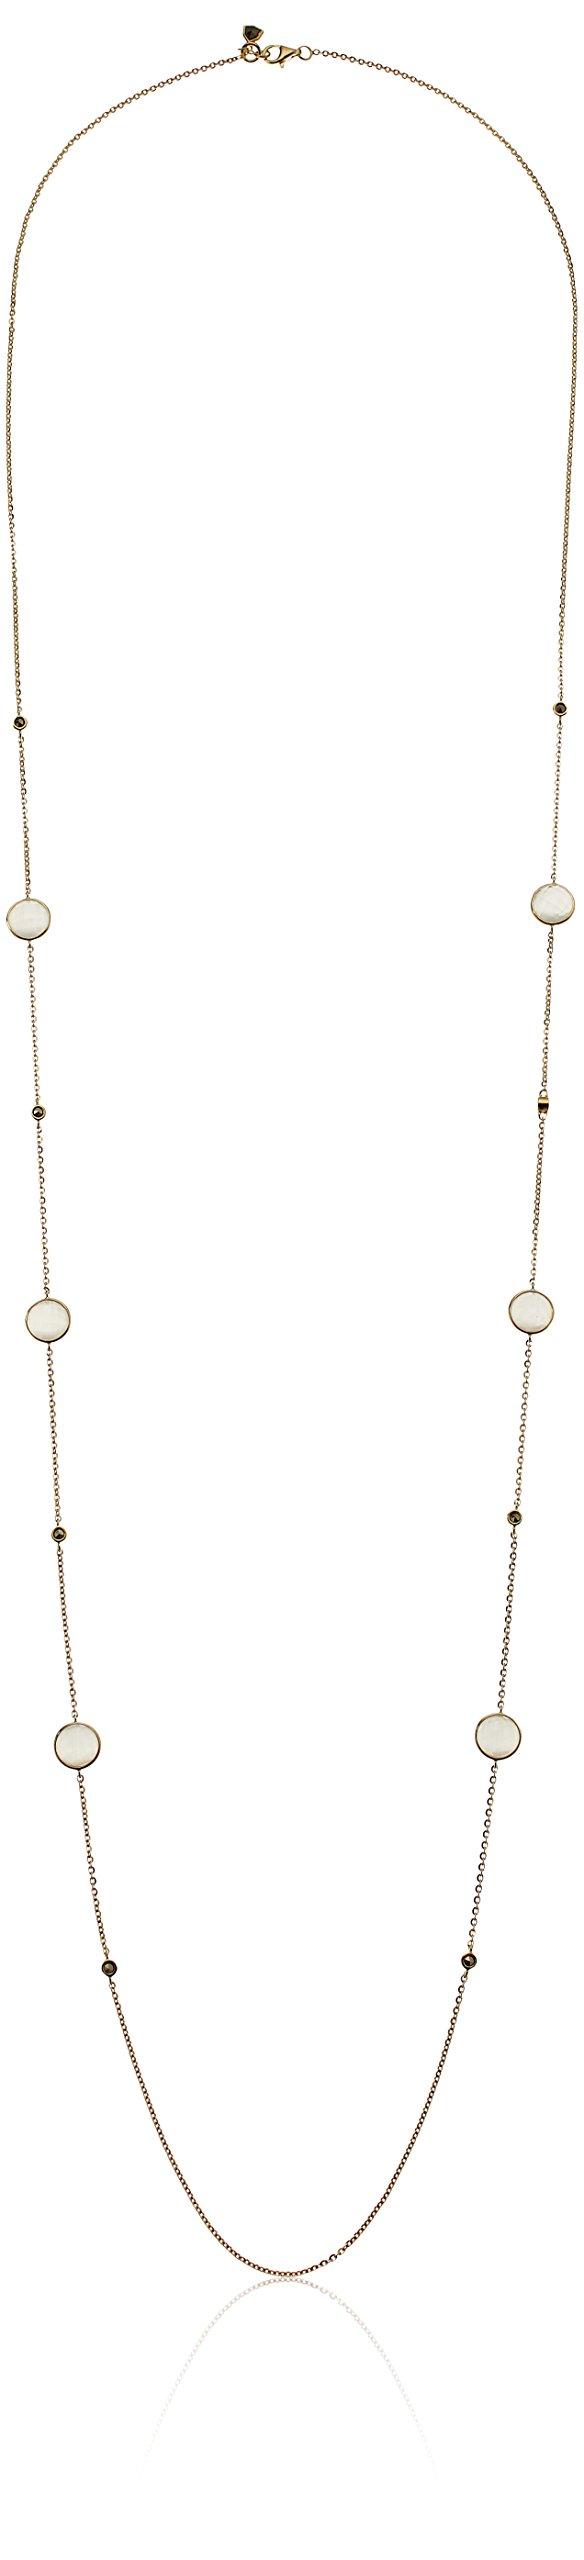 Judith Jack Sterling Silver/Swarovski Marcasite Gold-Tone White Strand Necklace